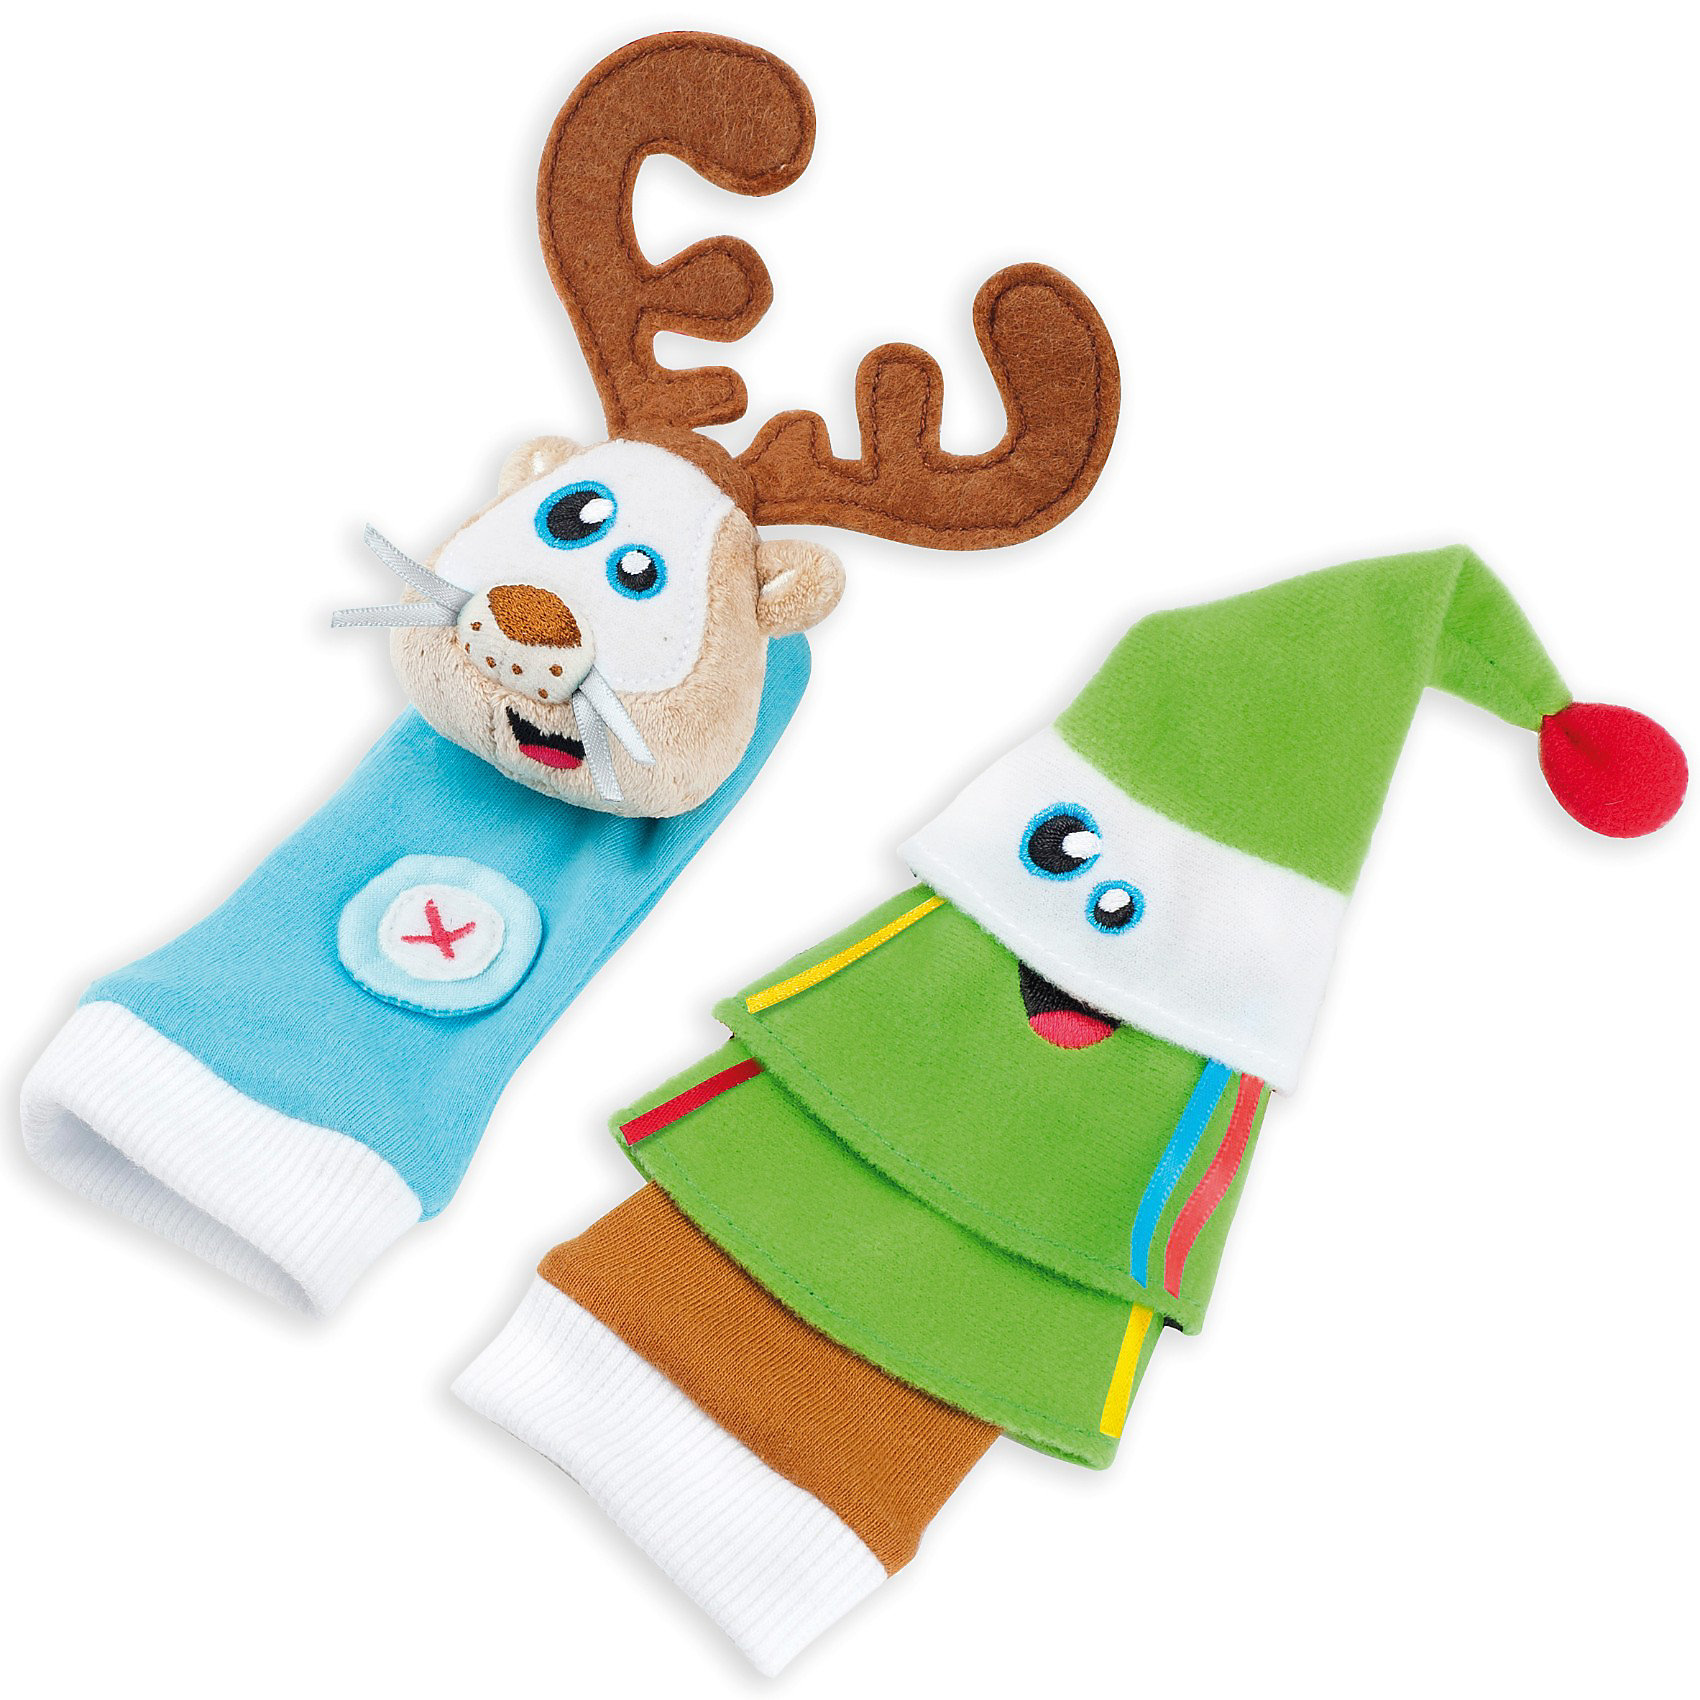 Babymoov Развивающие игрушки-носочки «Олененок и елочка» 0+ Babymoov babymoov